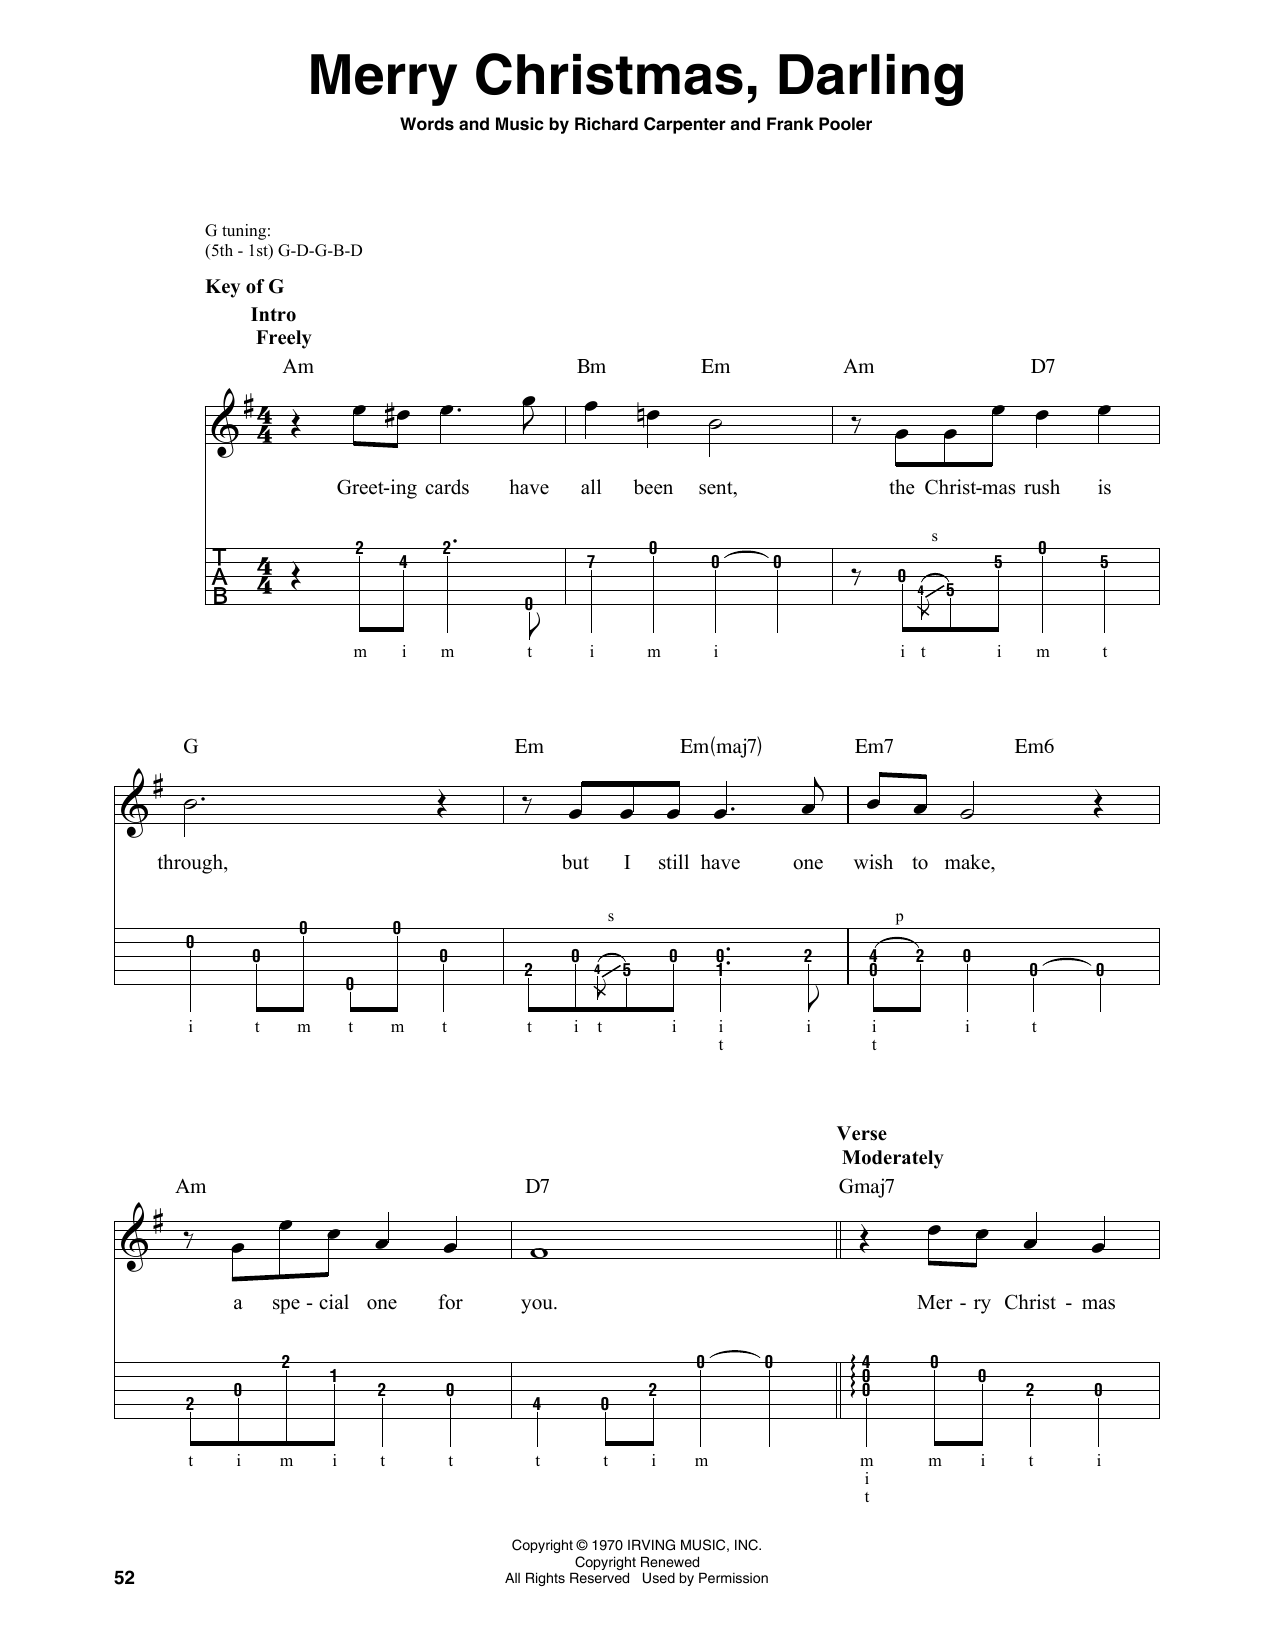 Merry Christmas, Darling (Banjo Tab)